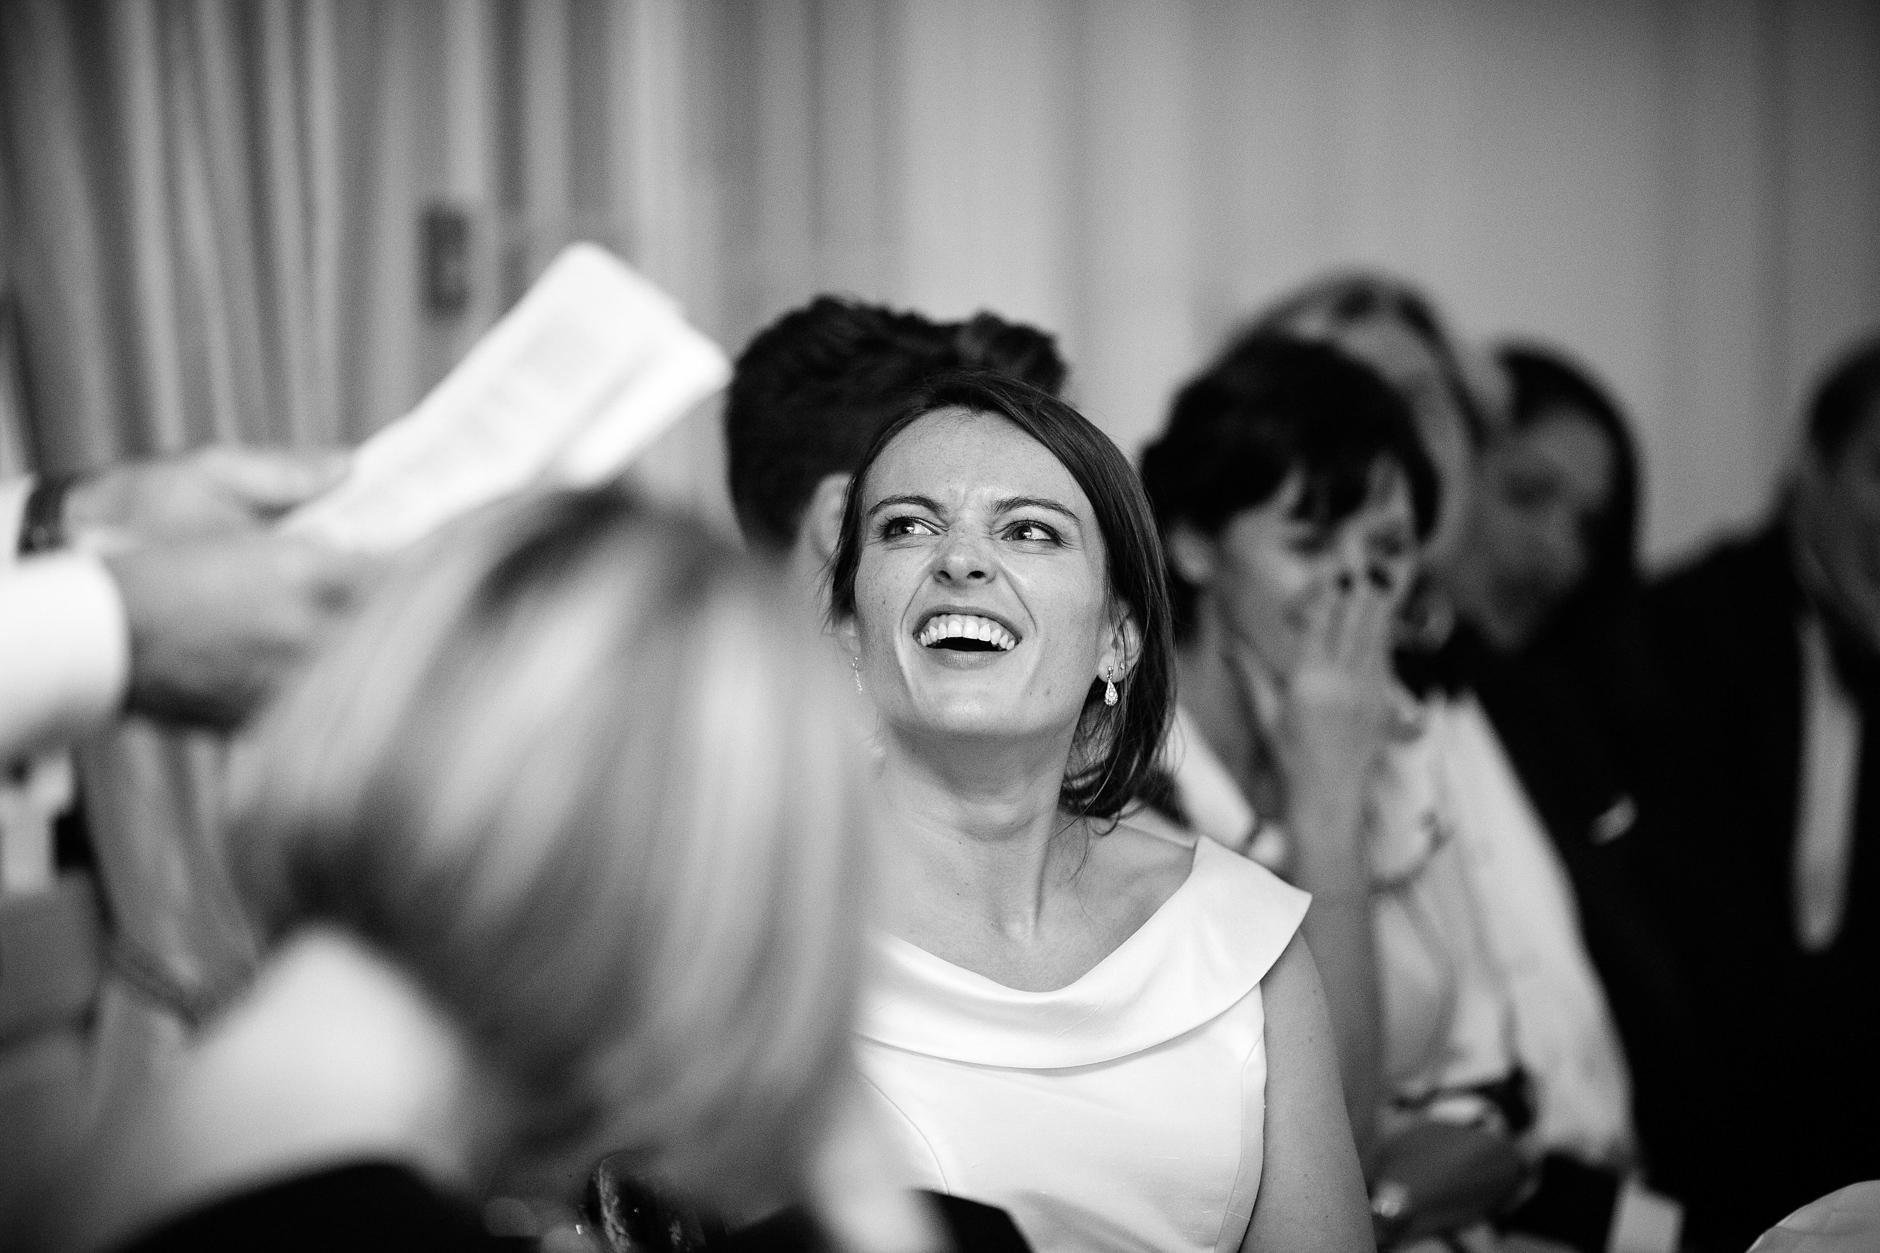 Glentruim-Wedding-Nikki-Leadbetter-Photography-281.jpg